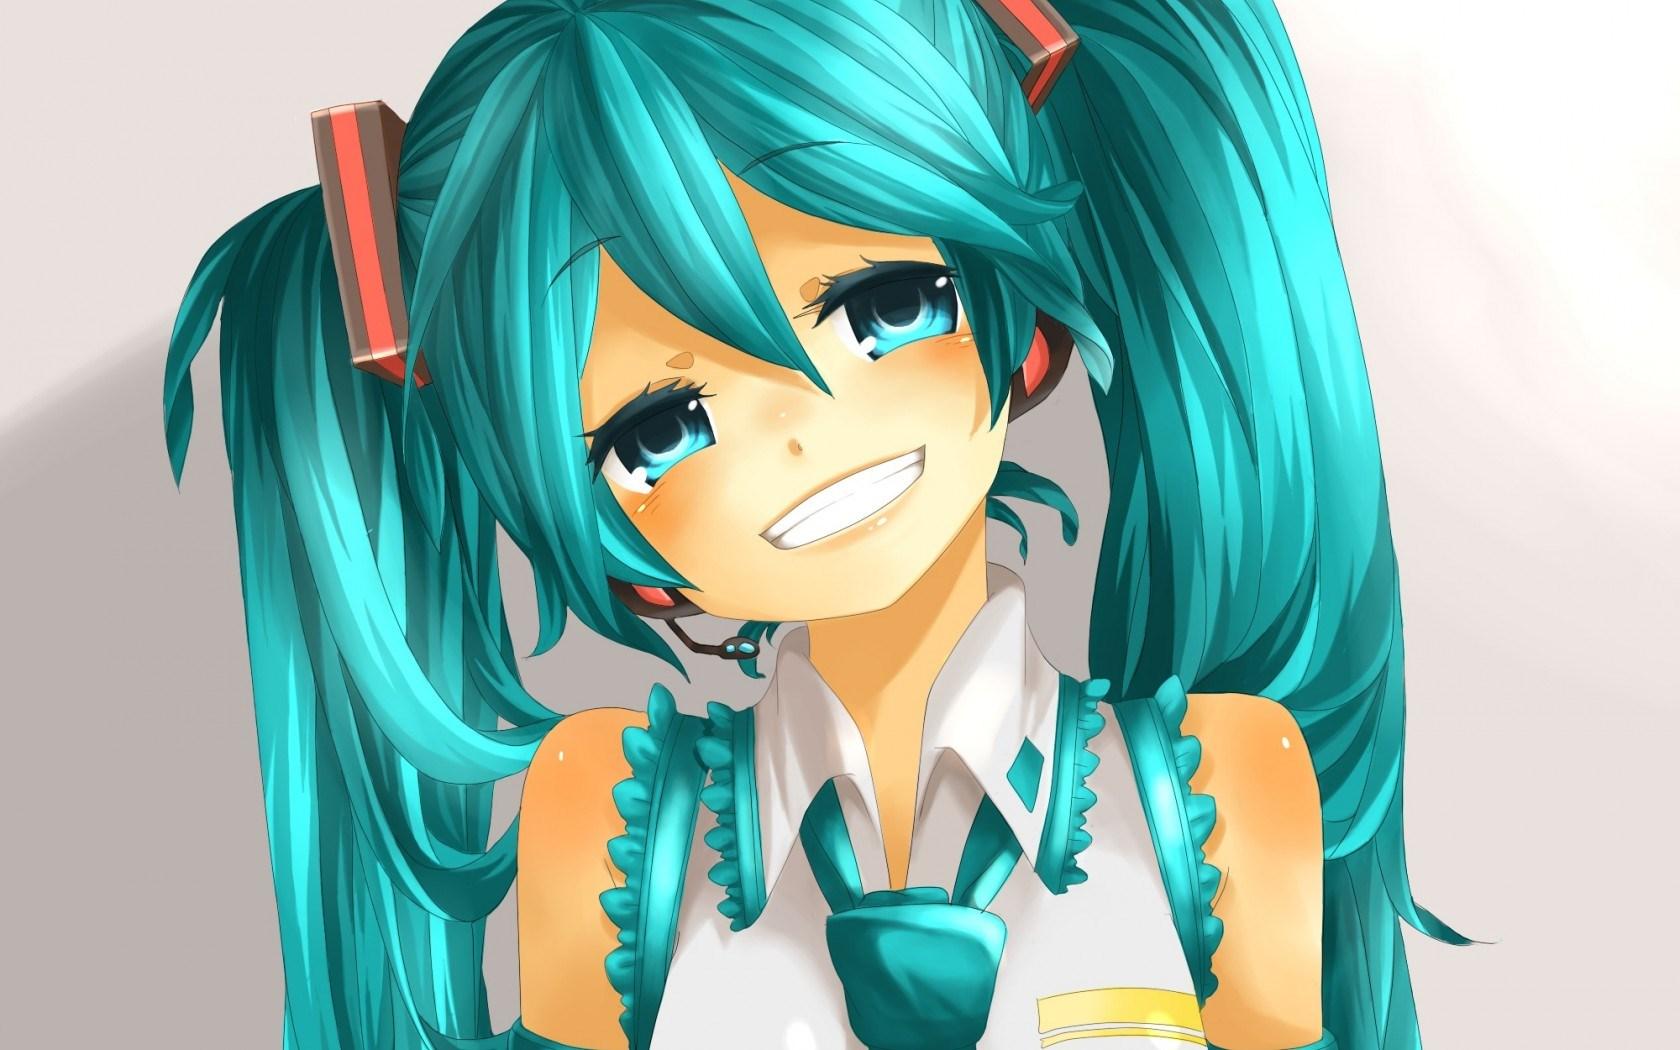 Art Vocaloid Hatsune Miku Girl Smile Anime